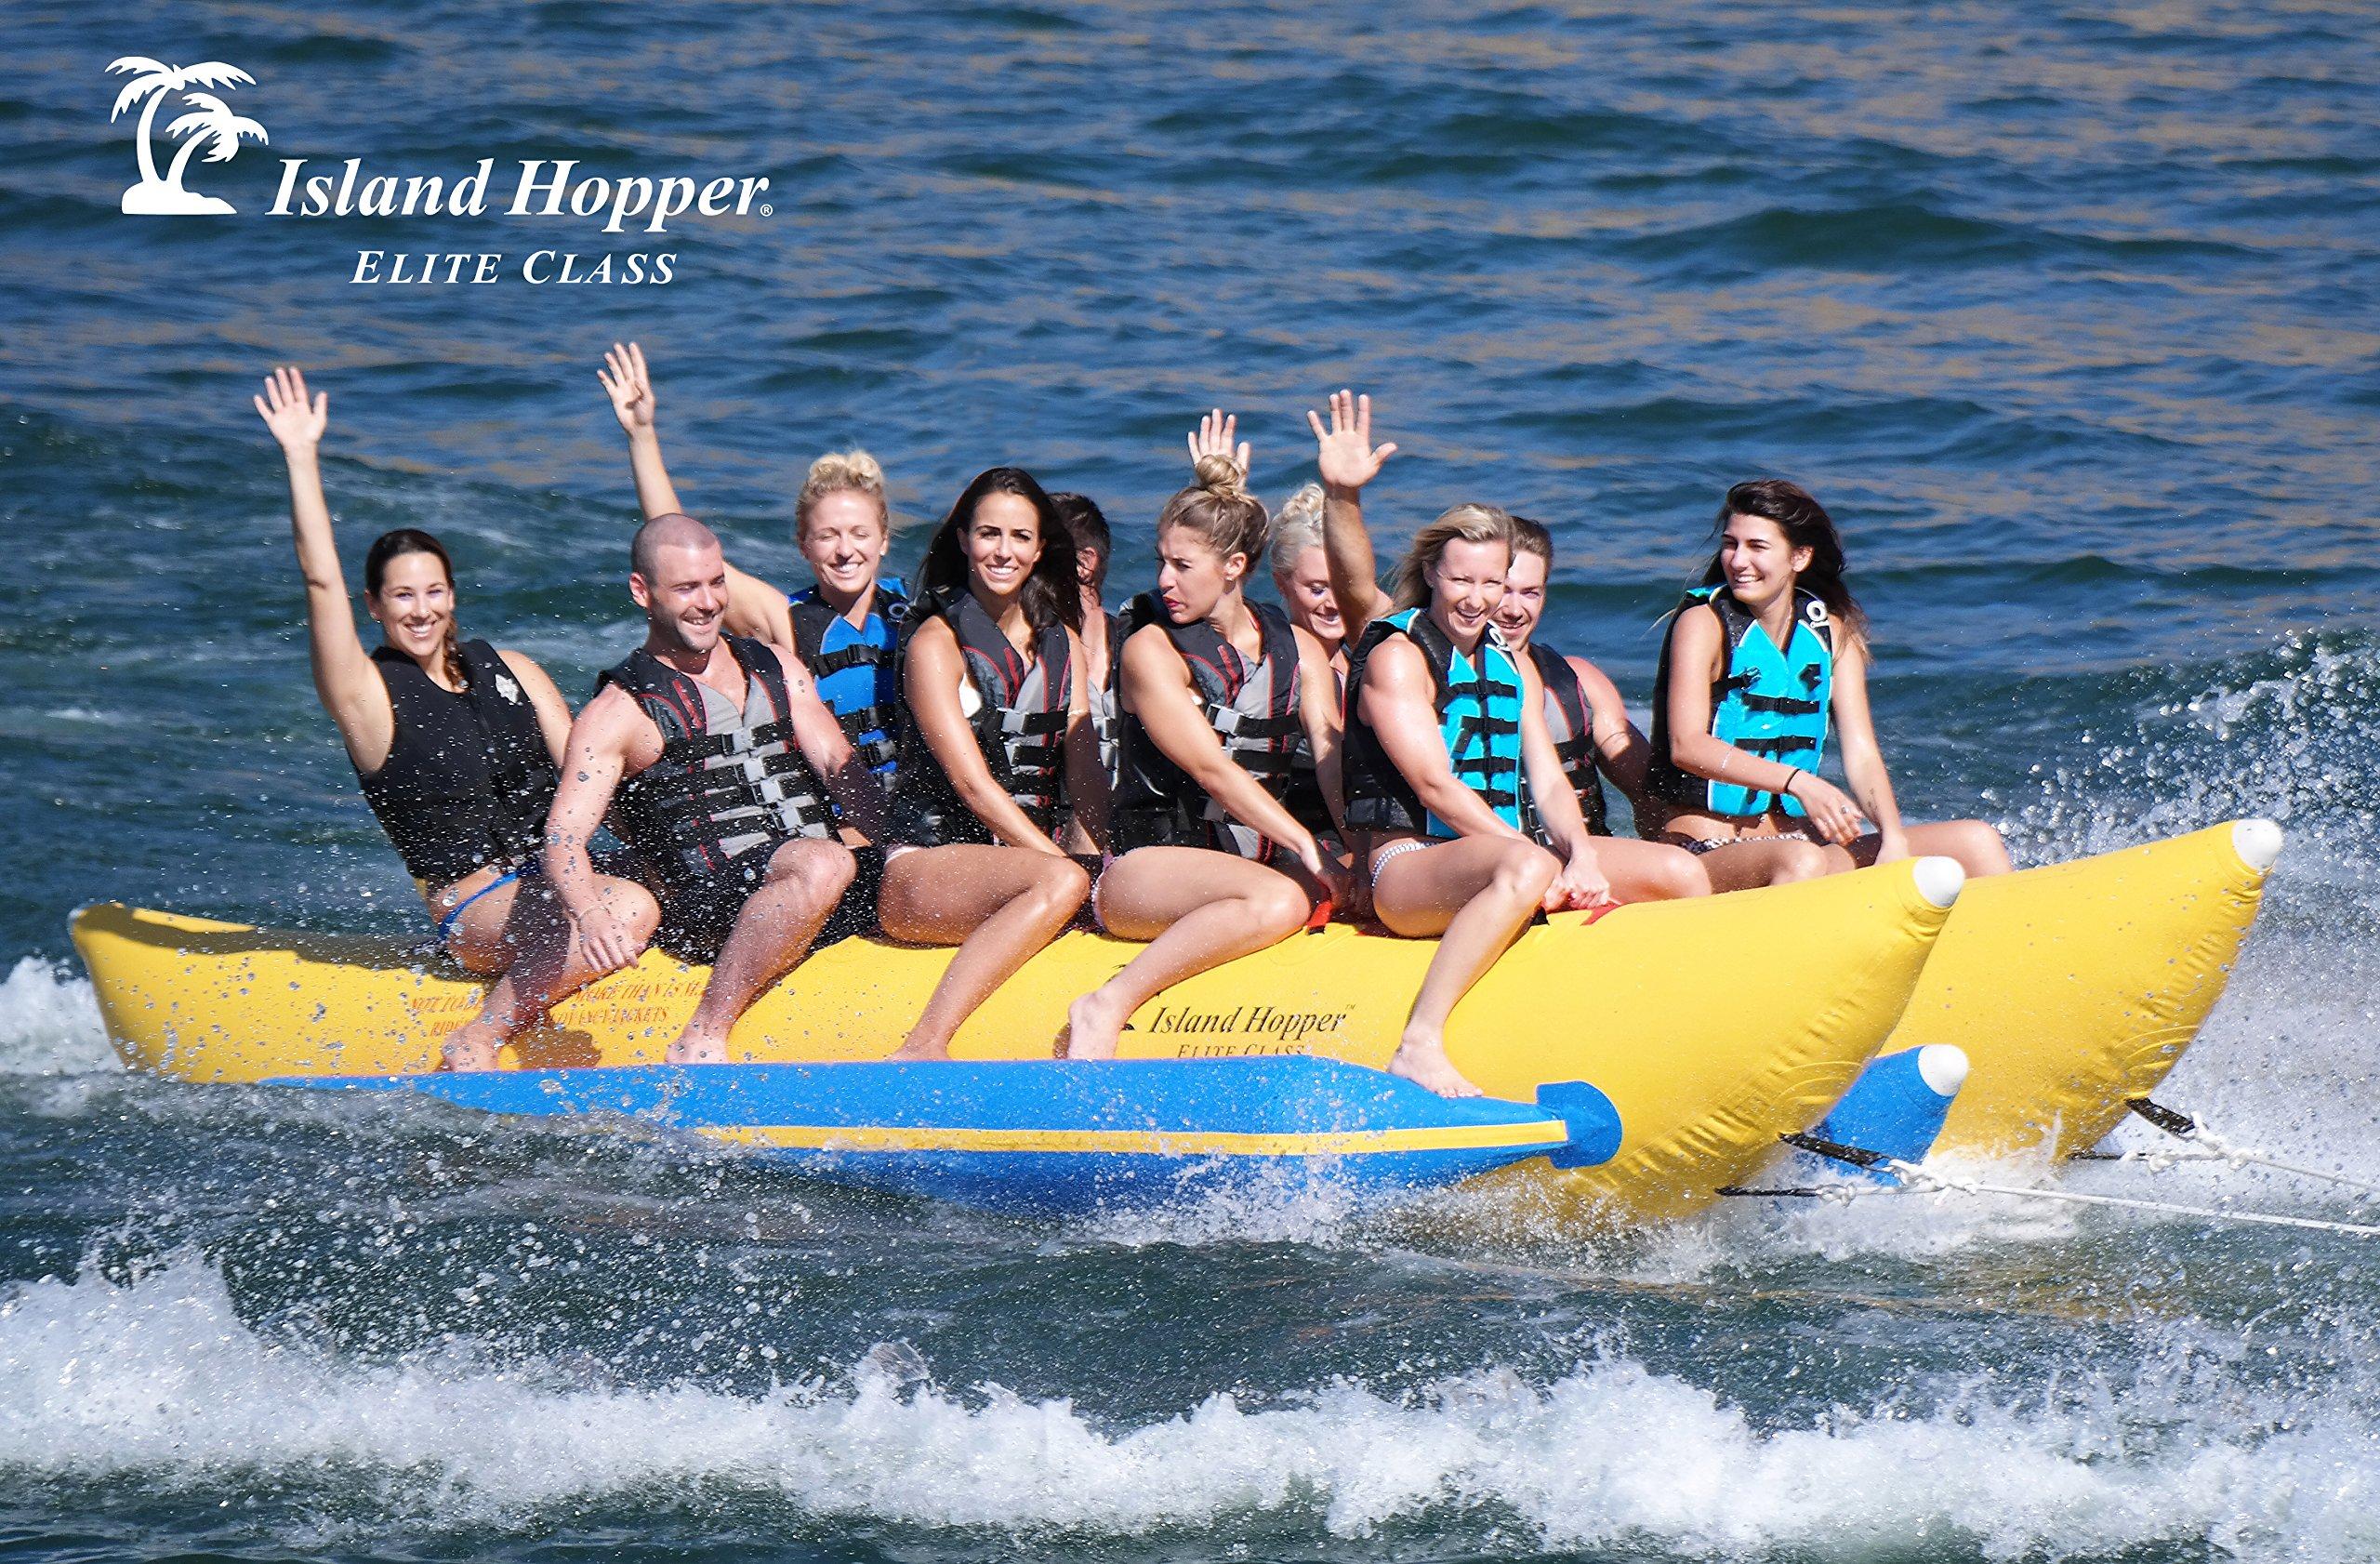 Island Hopper 10 Passenger ''Heavy Commercial'' Banana-boat by Island Hopper